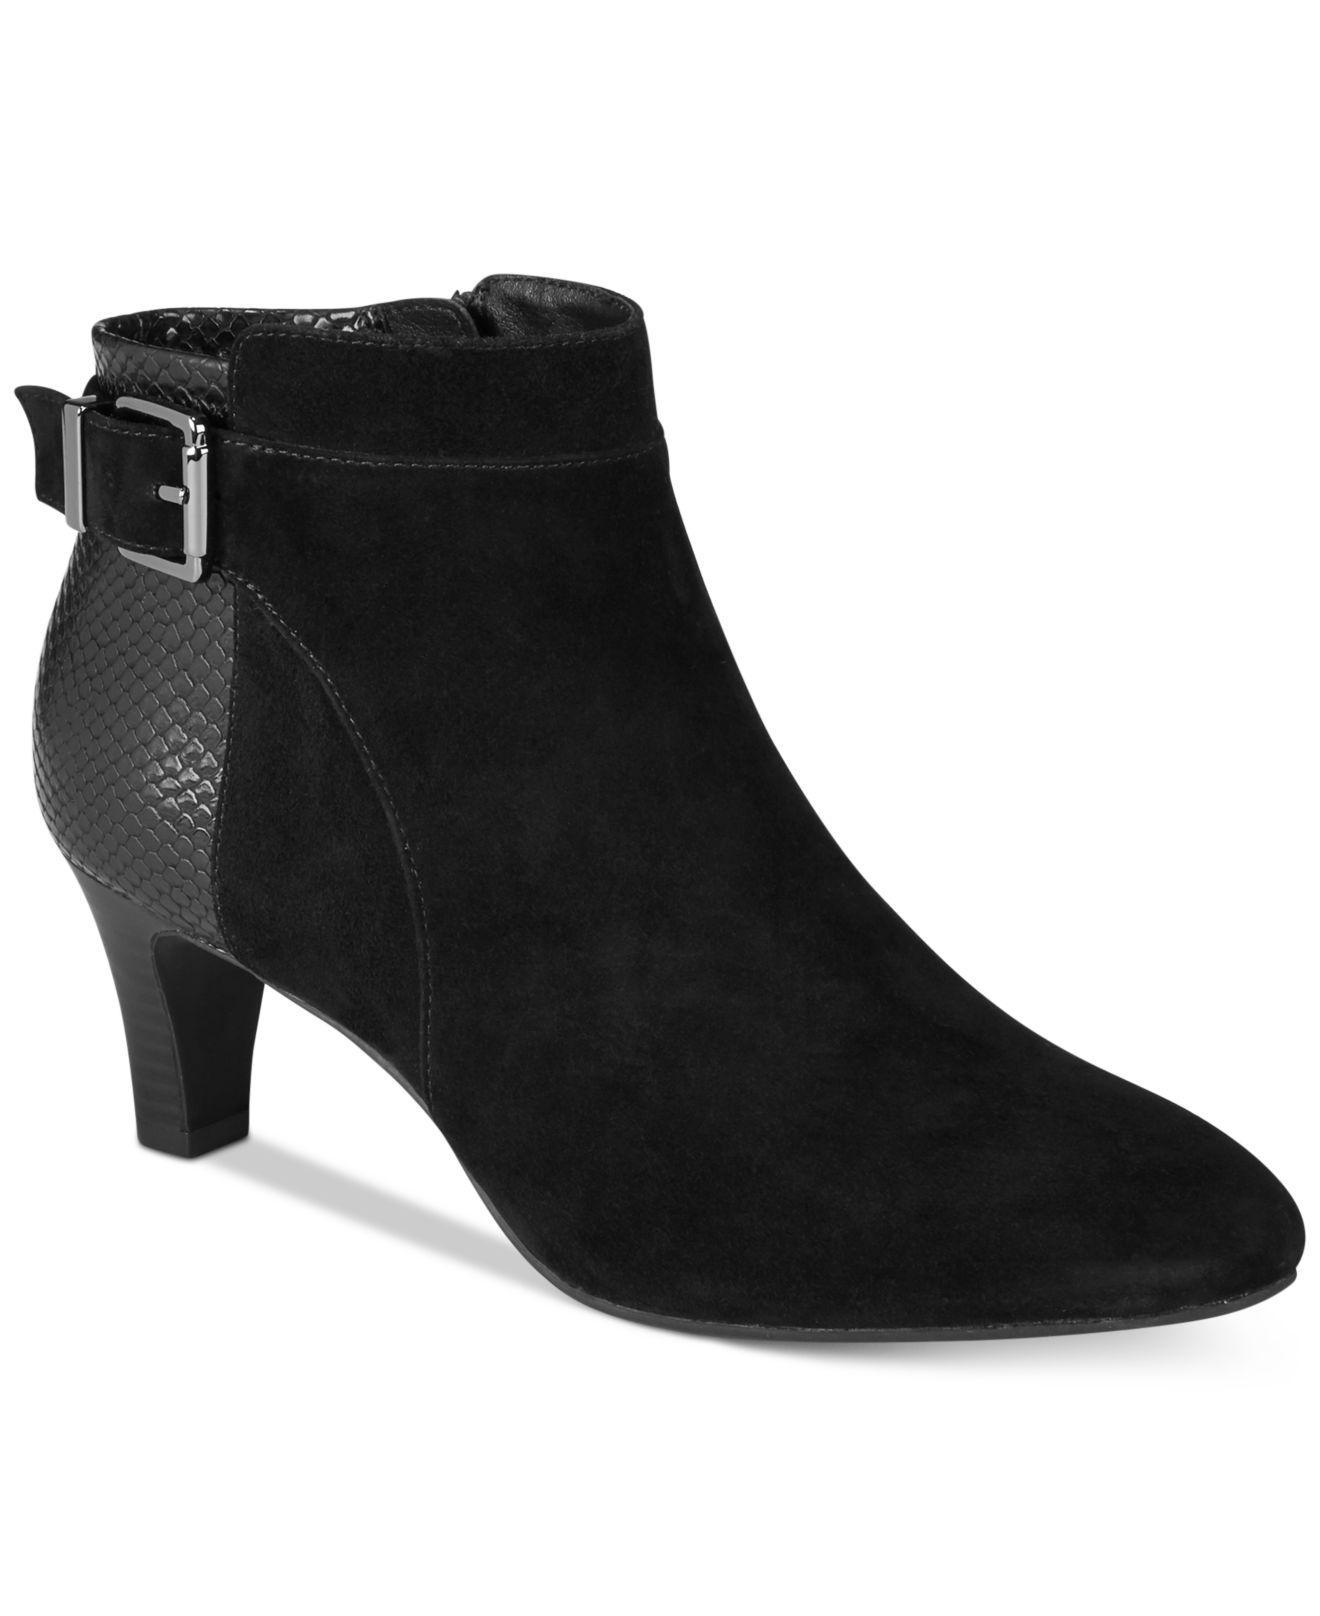 Alfani Damenschuhe Viollet Leder Closed Toe  Ankle Fashion Stiefel  Toe    53fcd6